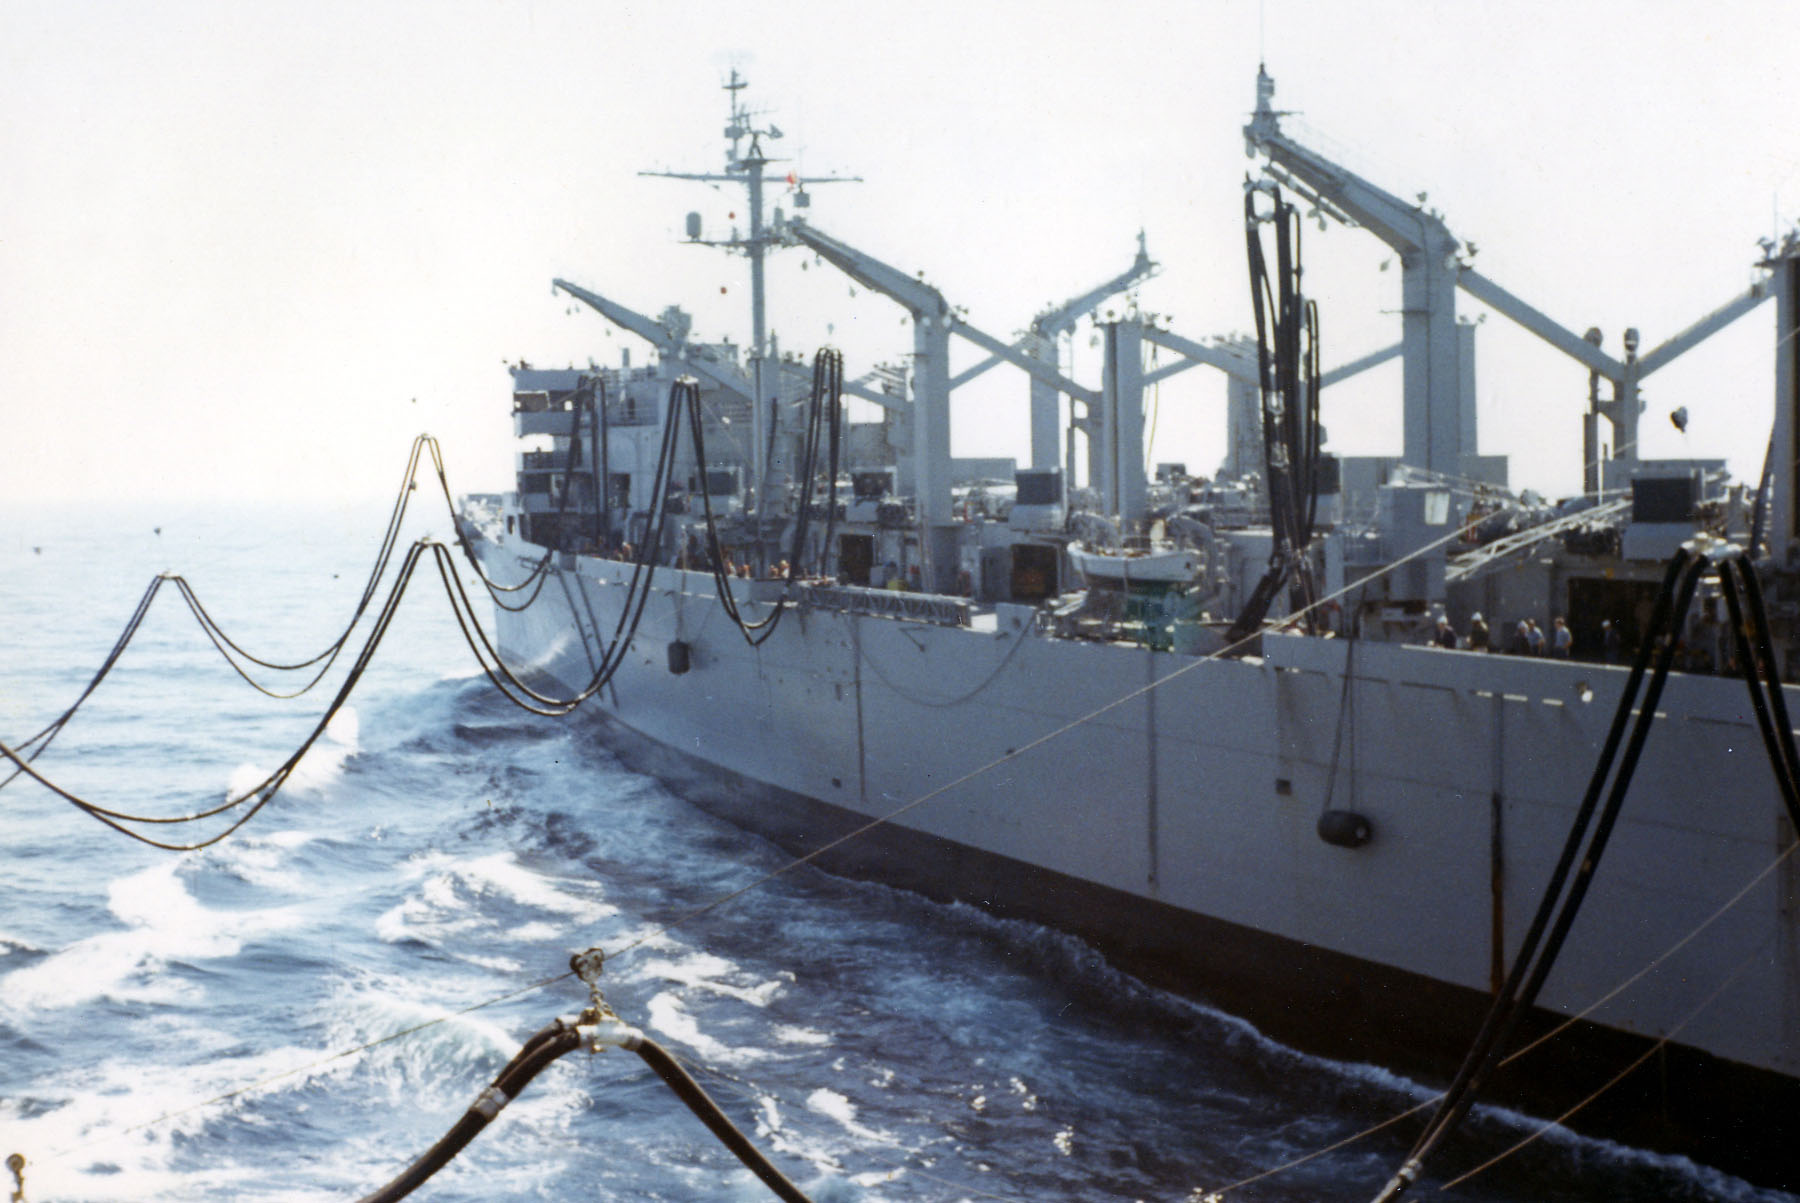 03-refueling-at-sea-01-w